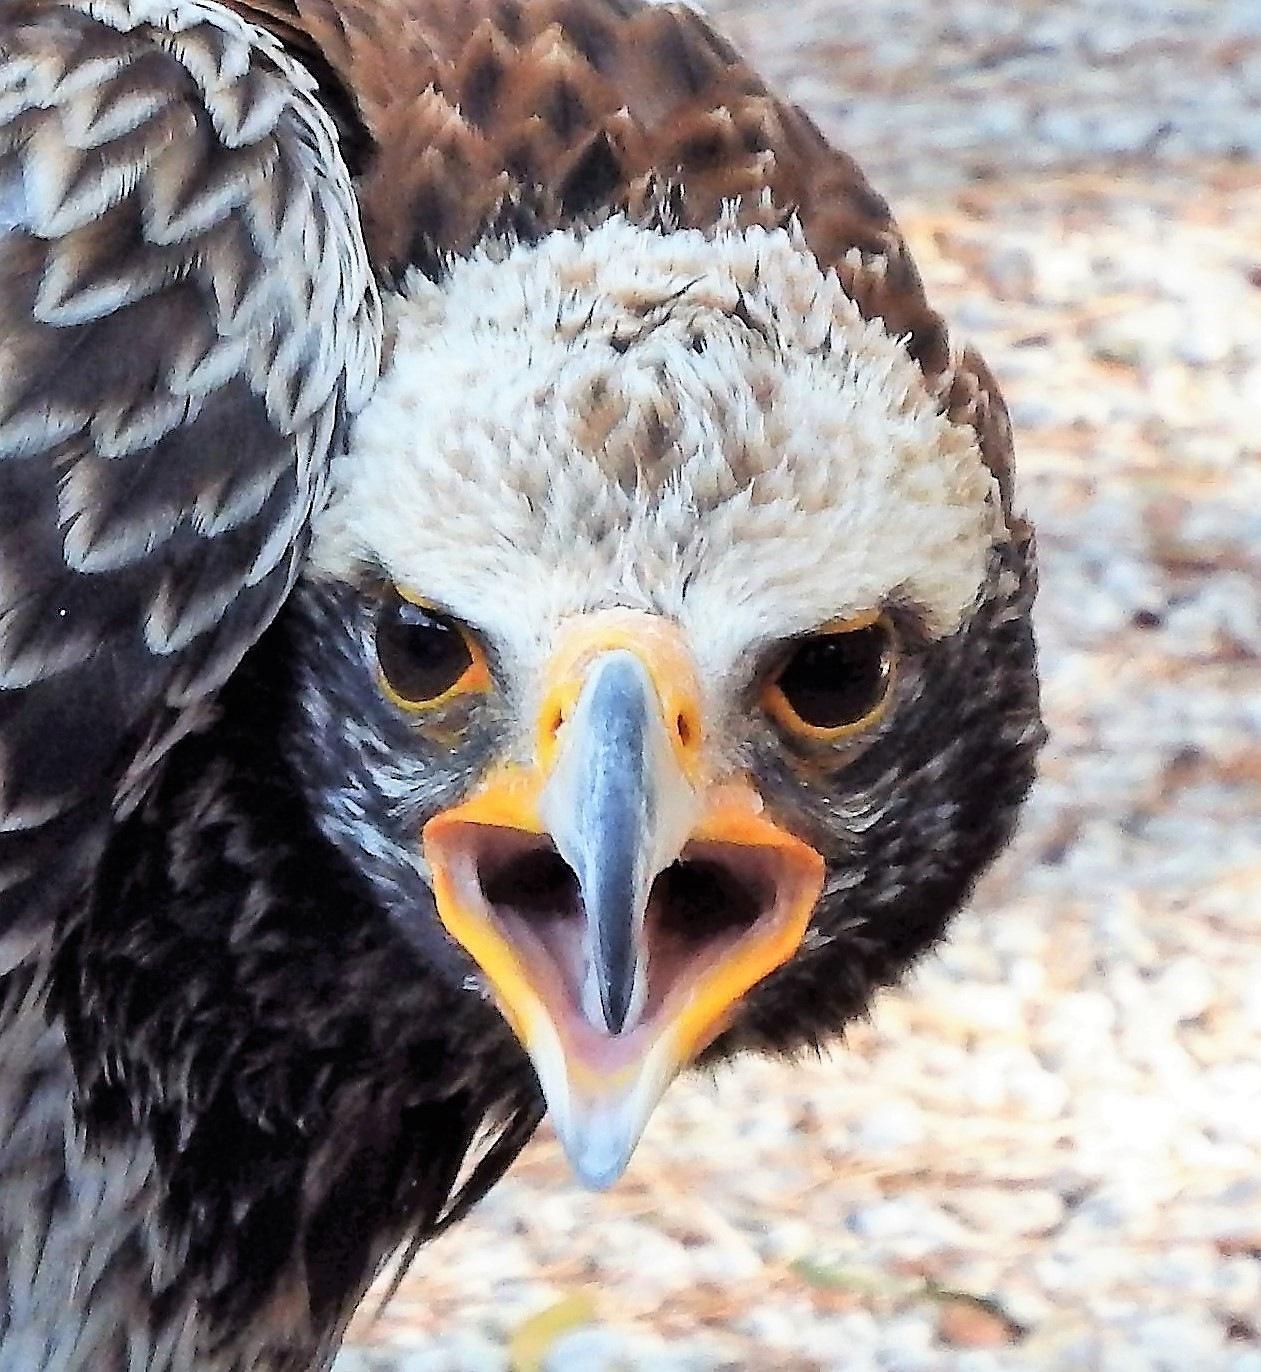 Falcon with an atitude! by Japie van der Berg